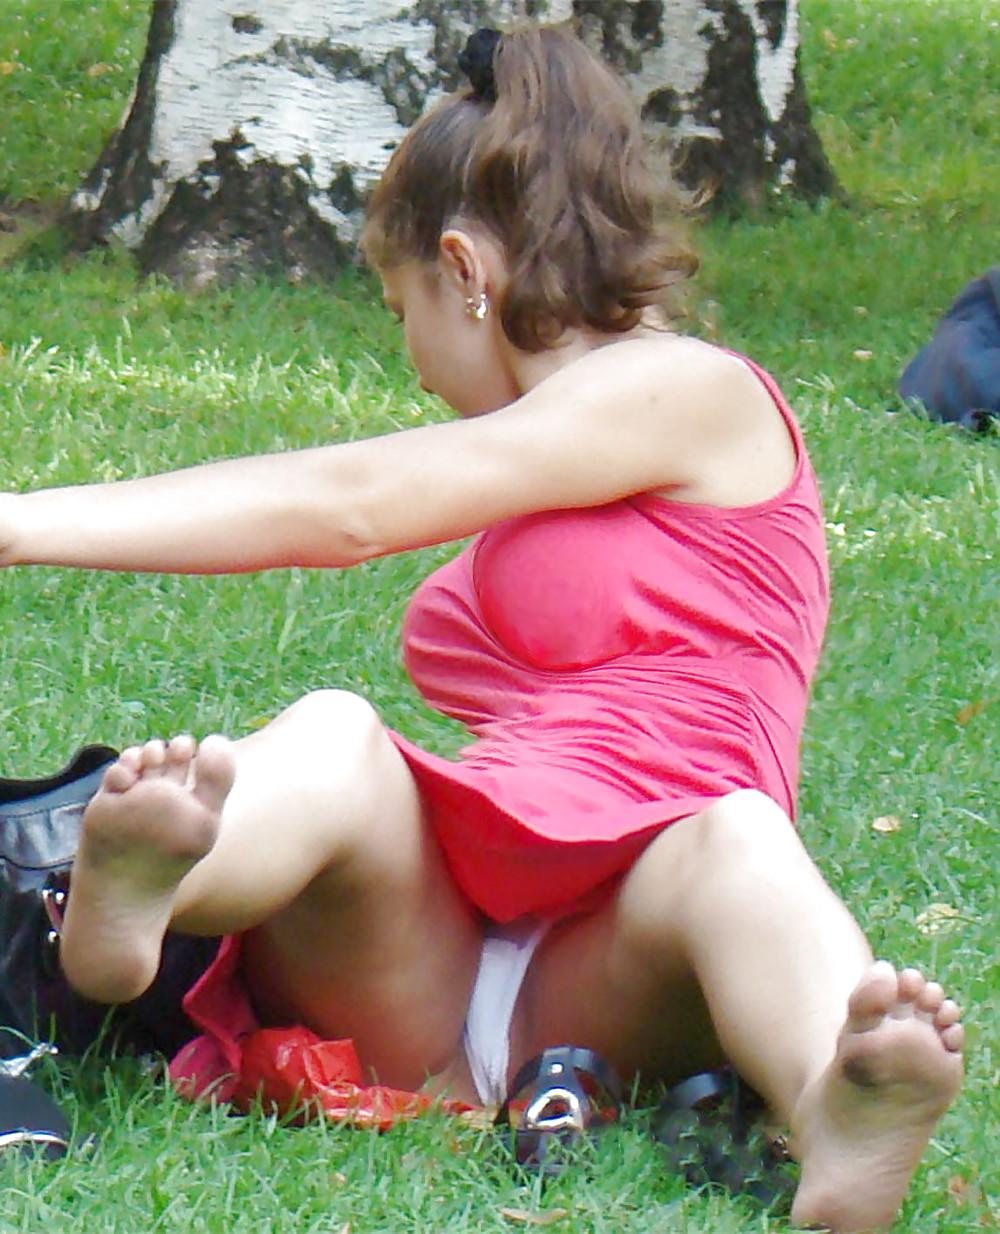 Denise masino pantyhose home video female bodybuilder